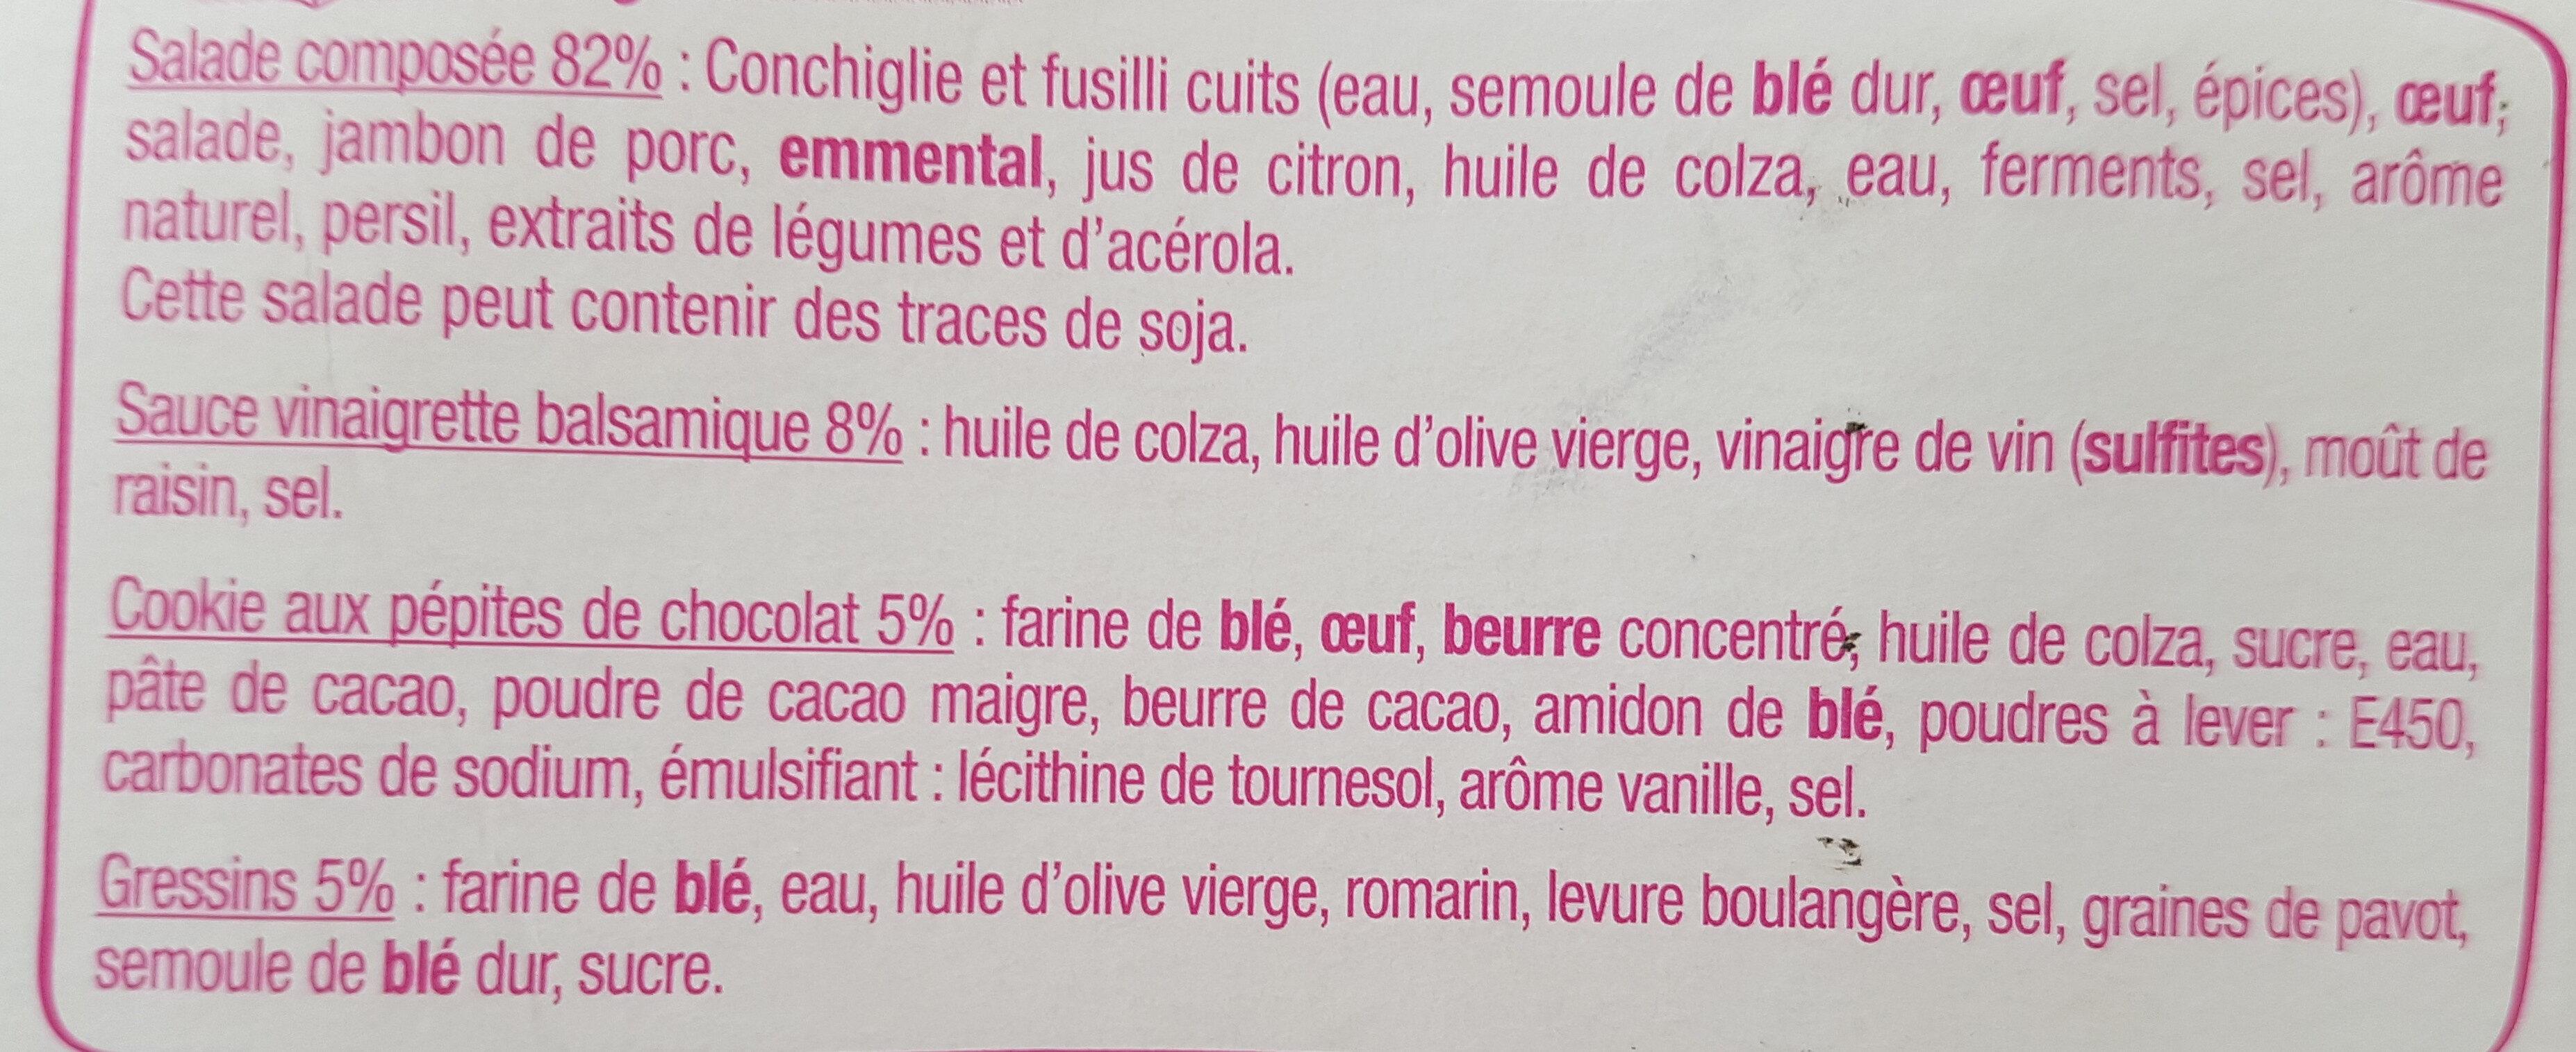 Salade & Compagnie - Montmartre - Ingrediënten - fr